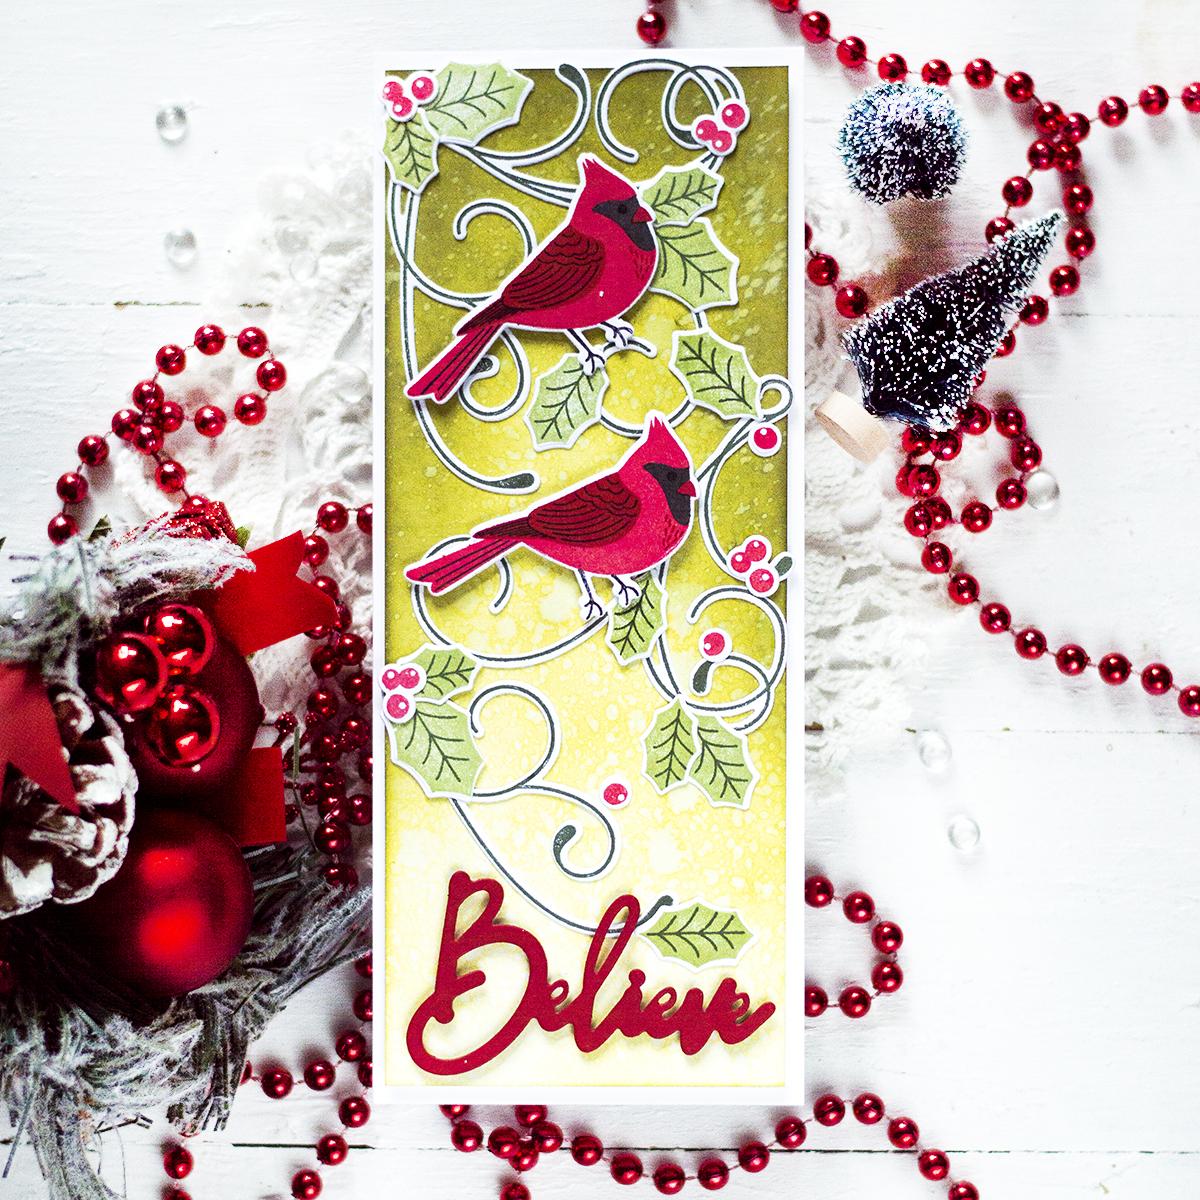 Christmas Cardinals Slimline Card. Card by Svitlana Shayevich